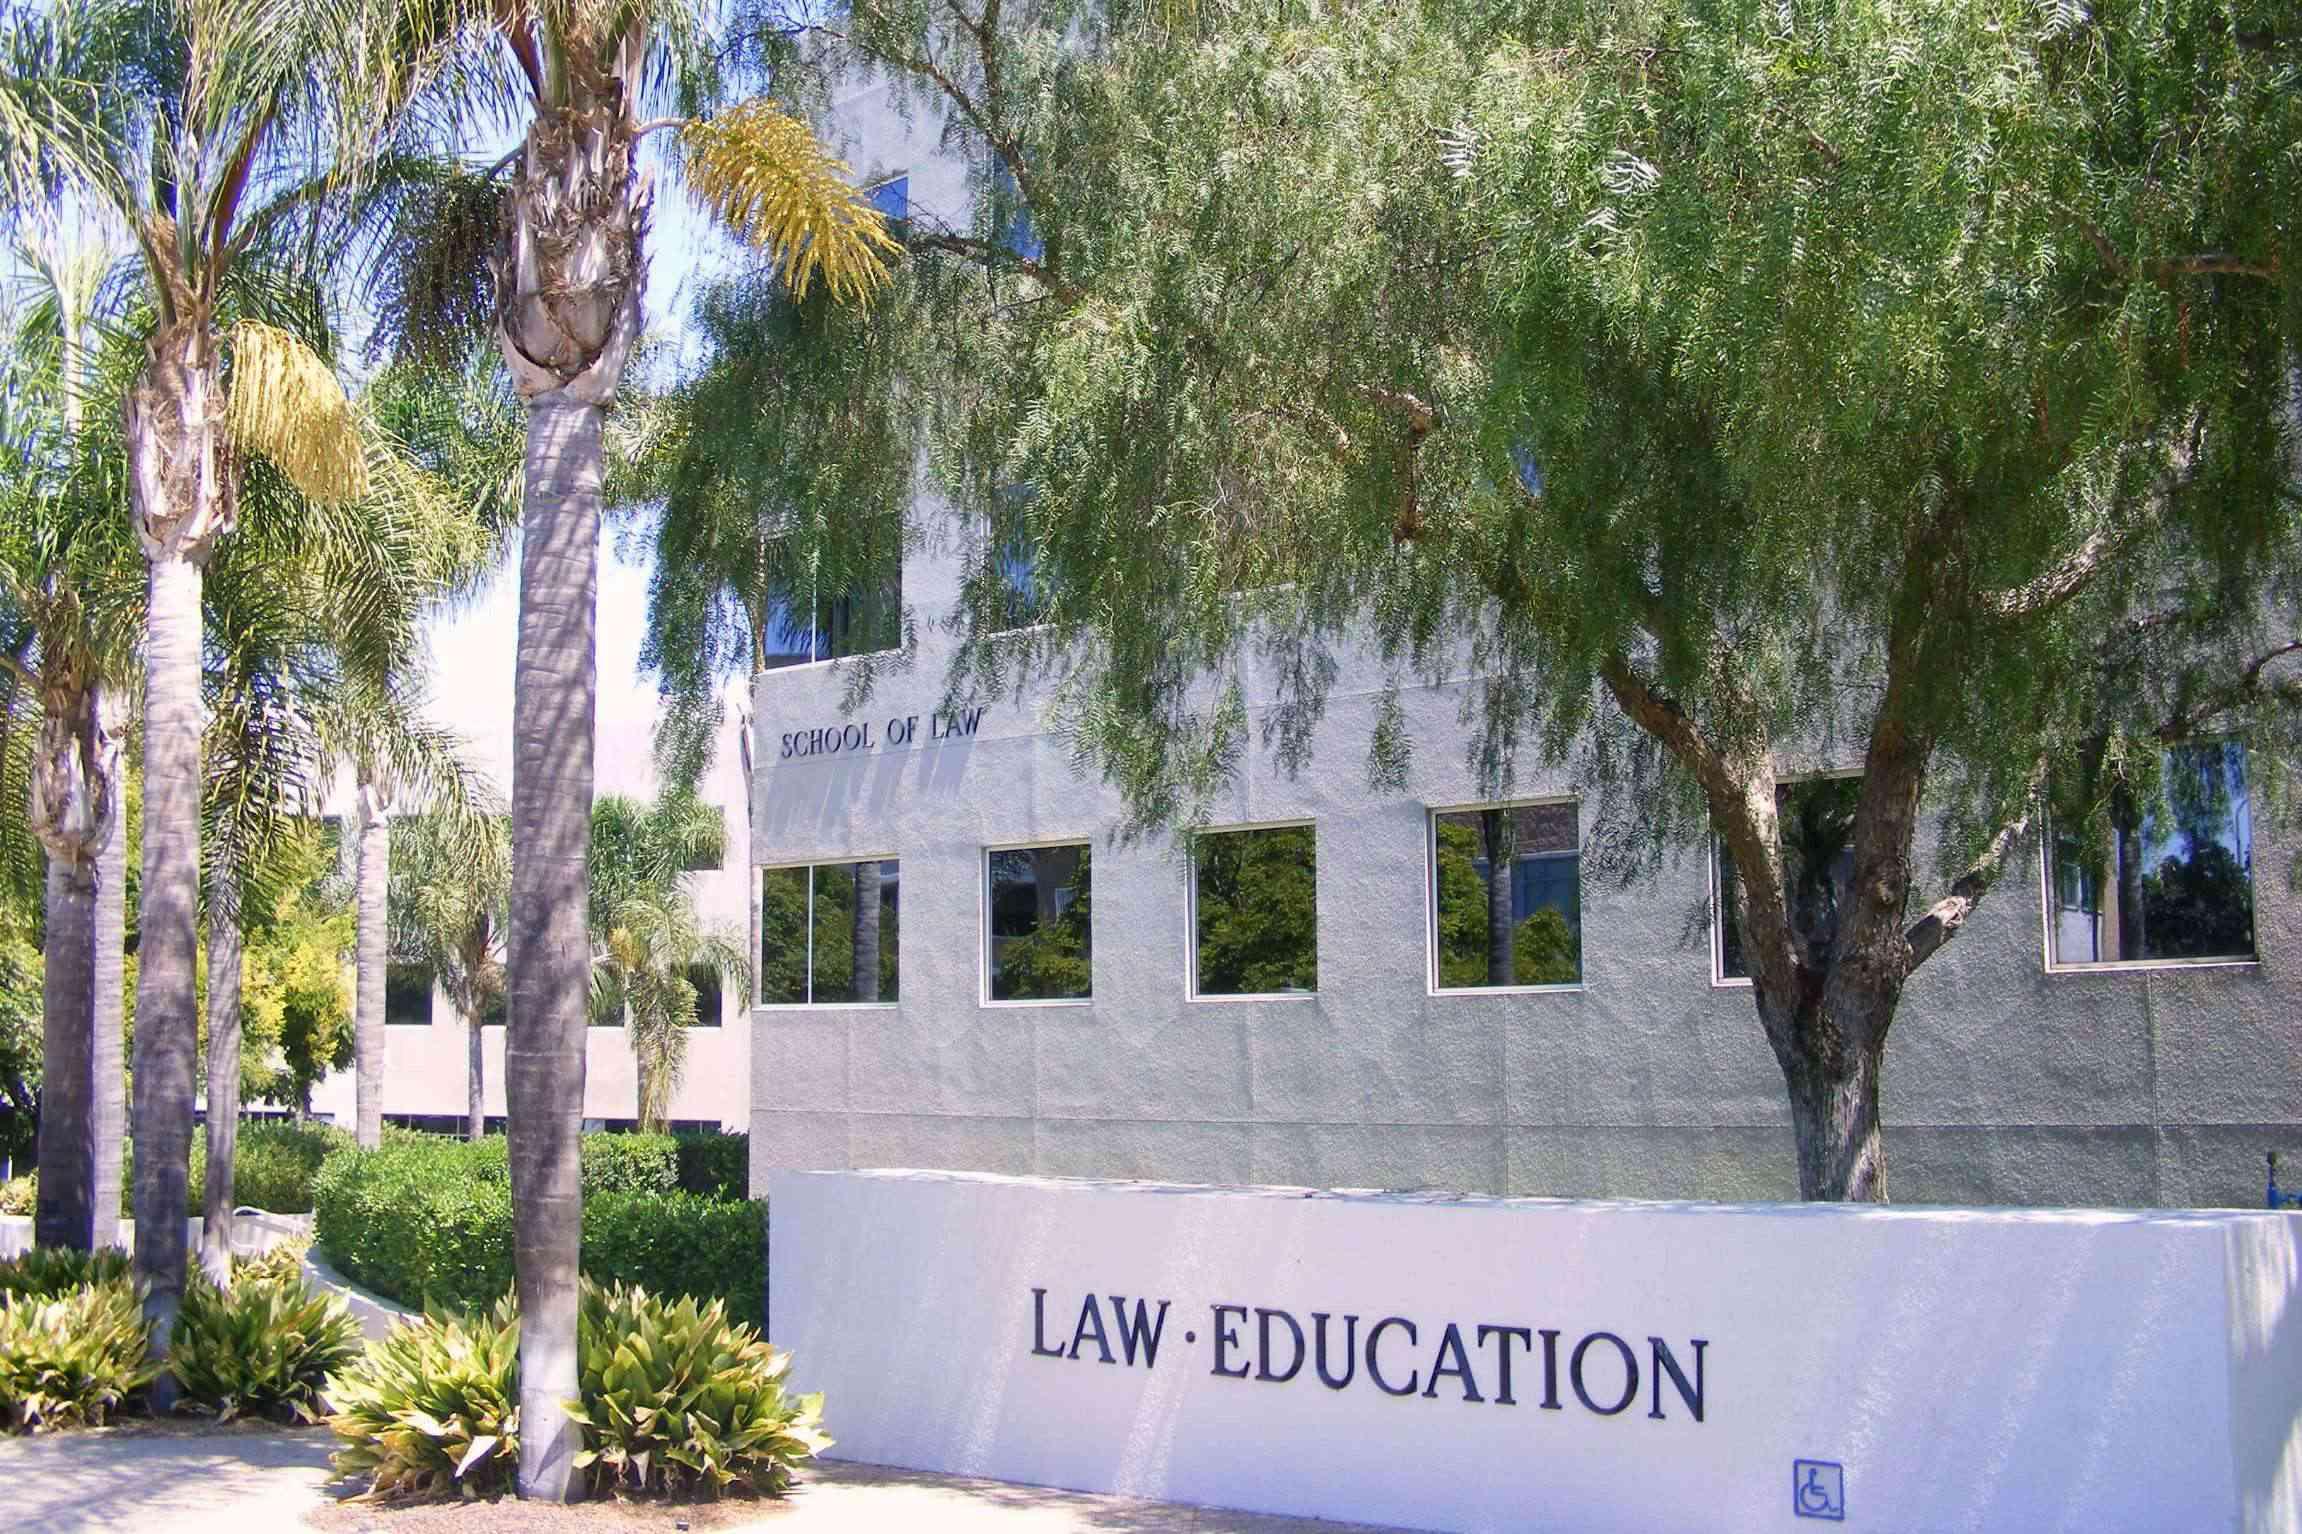 University of California Irvine School of Law